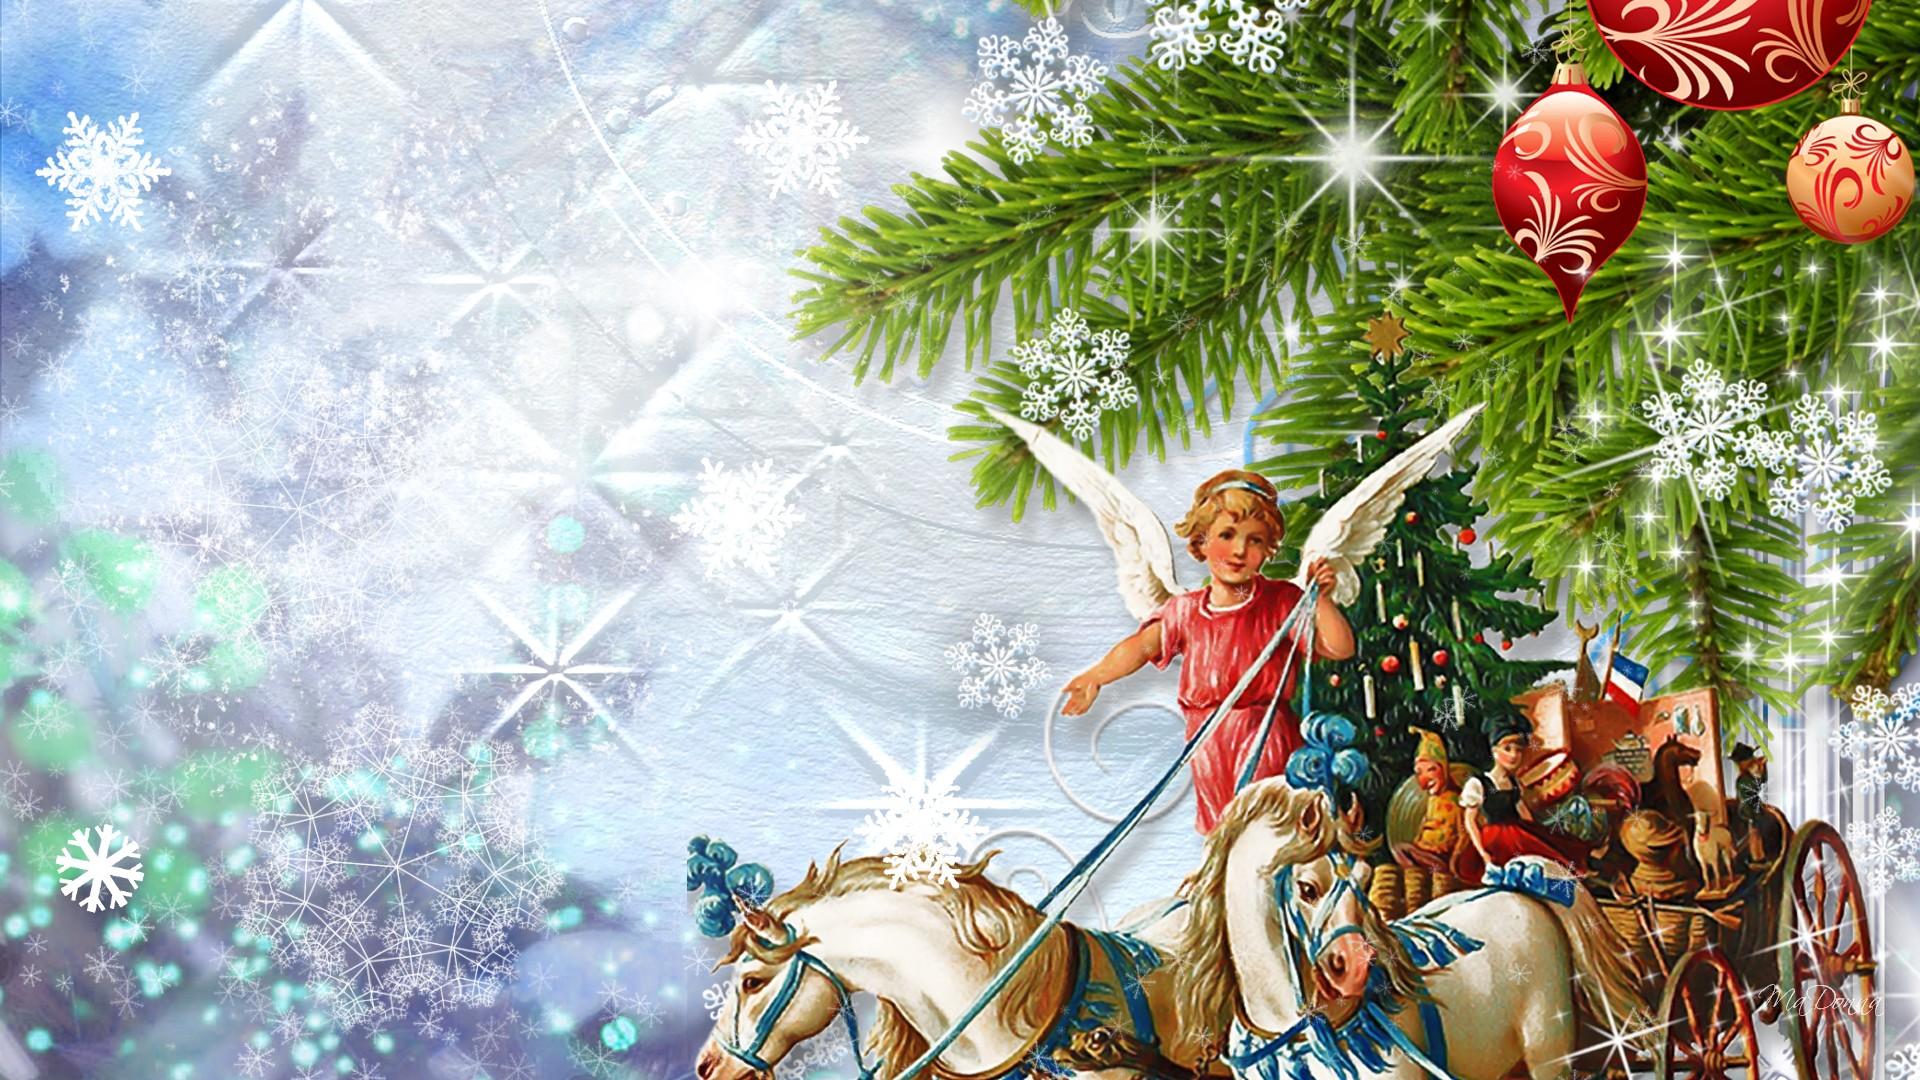 Christmas Angels Wallpaper Sky HD Wallpaper 1920x1080